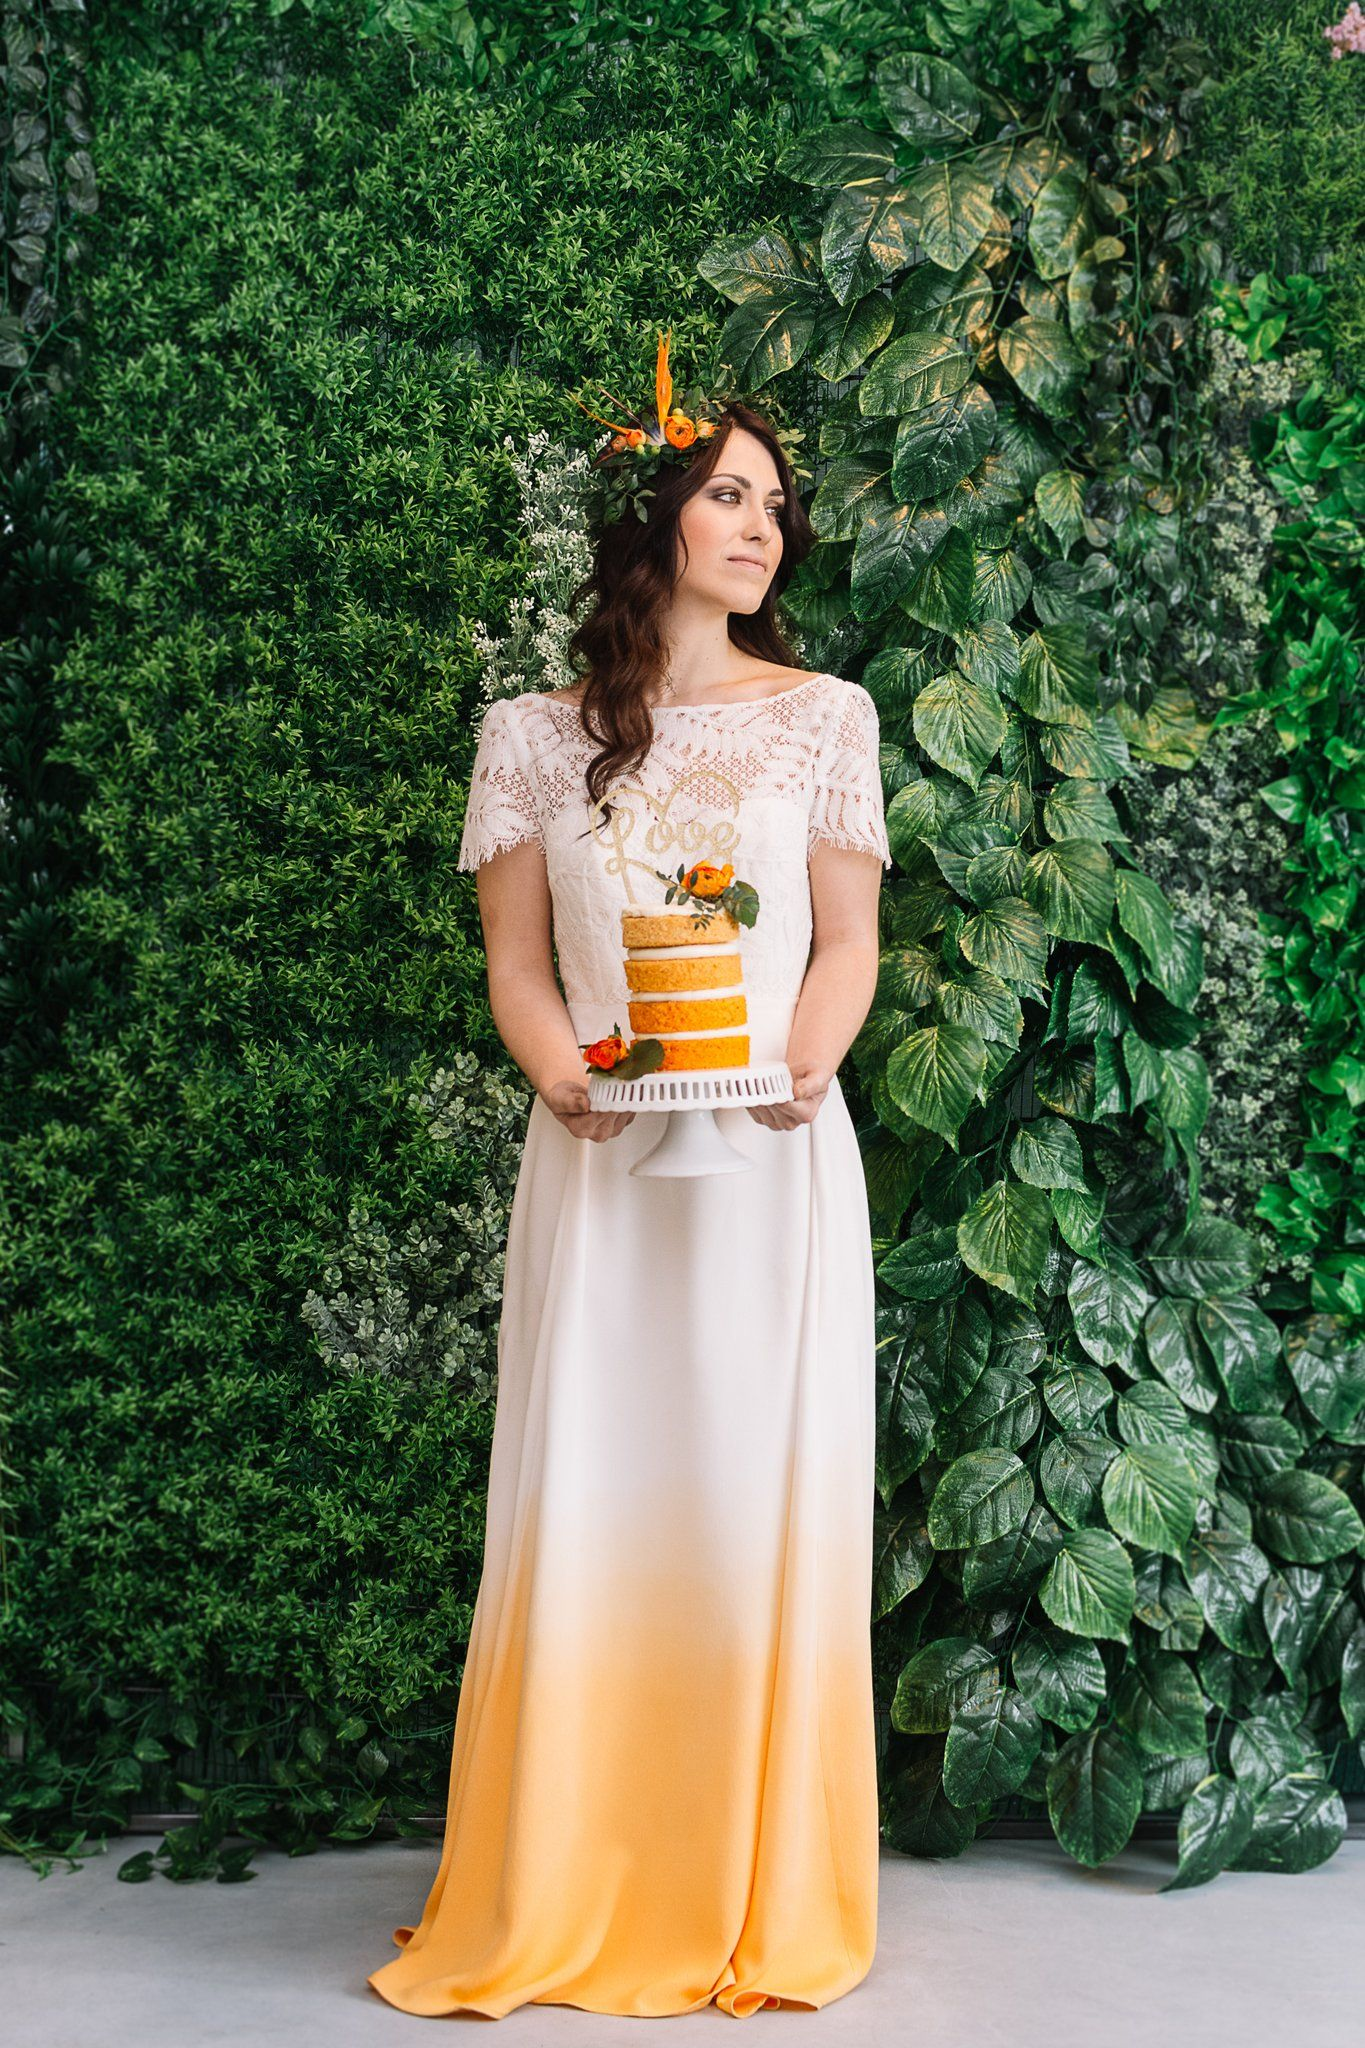 Dye wedding dress after wedding  Ziggy Stardust  Orange dip dye u Lucy Canut Dance  Wedding shtuff